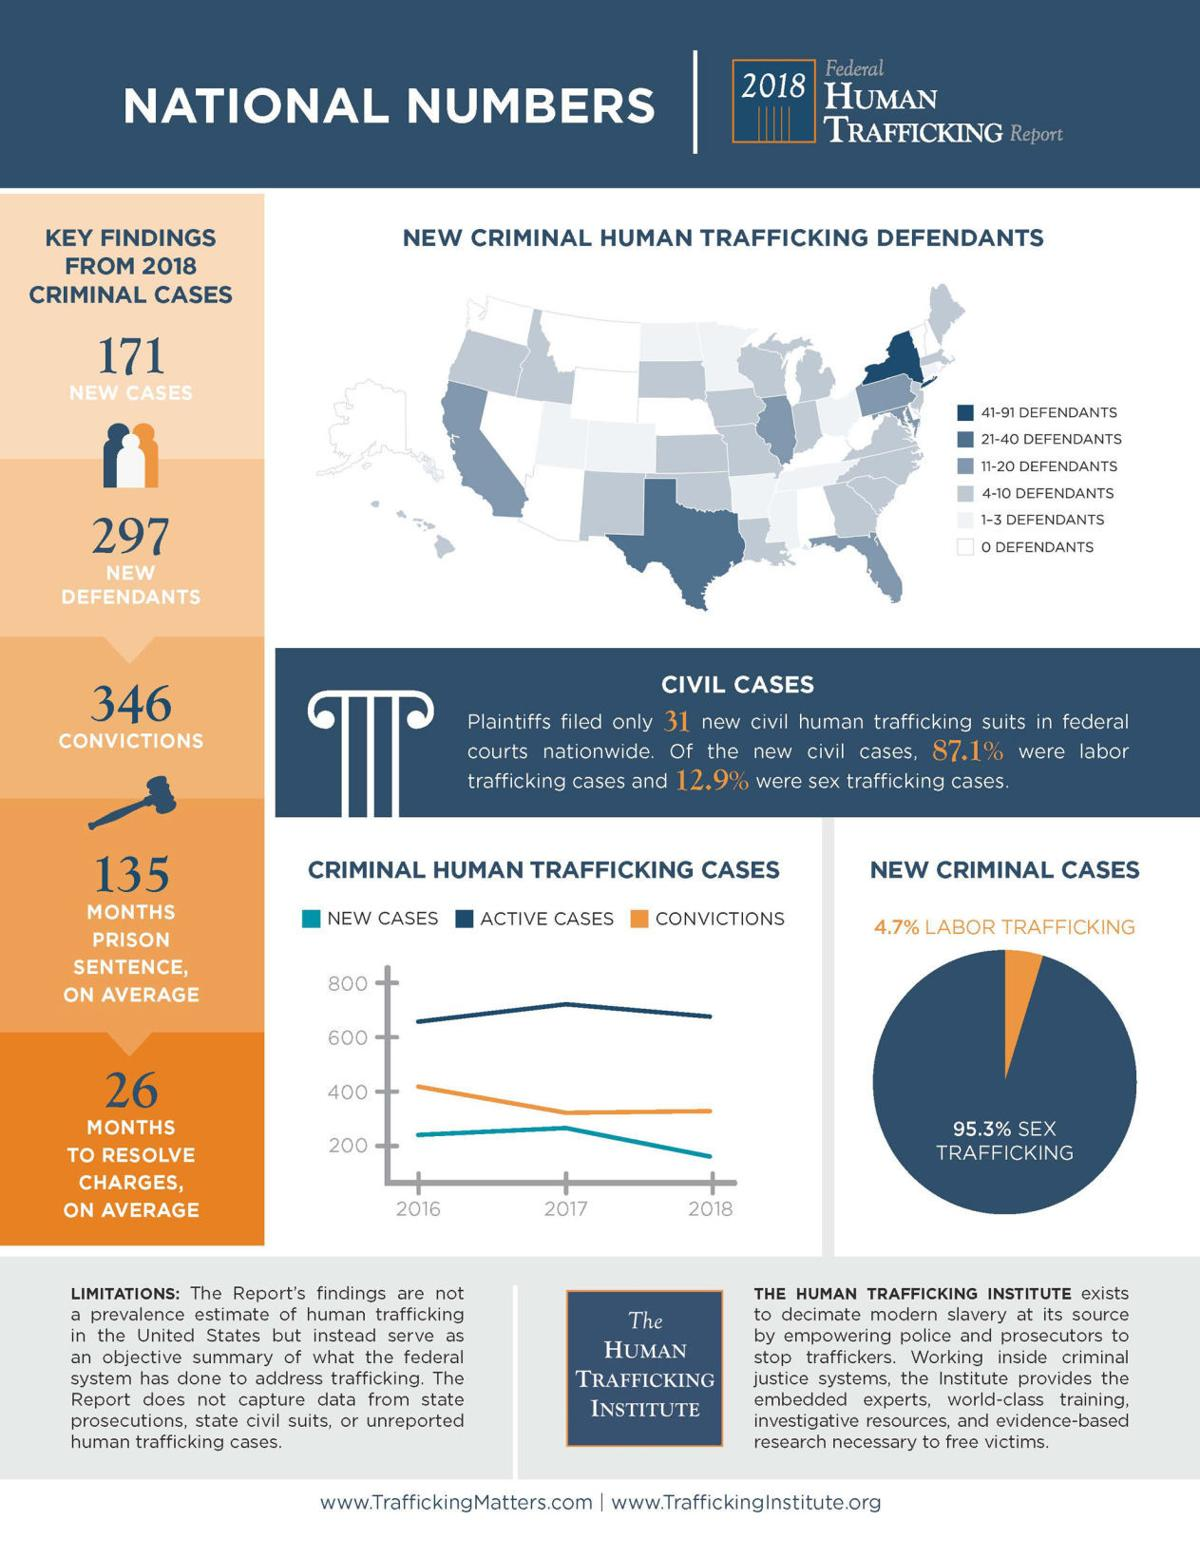 U.S. human trafficking